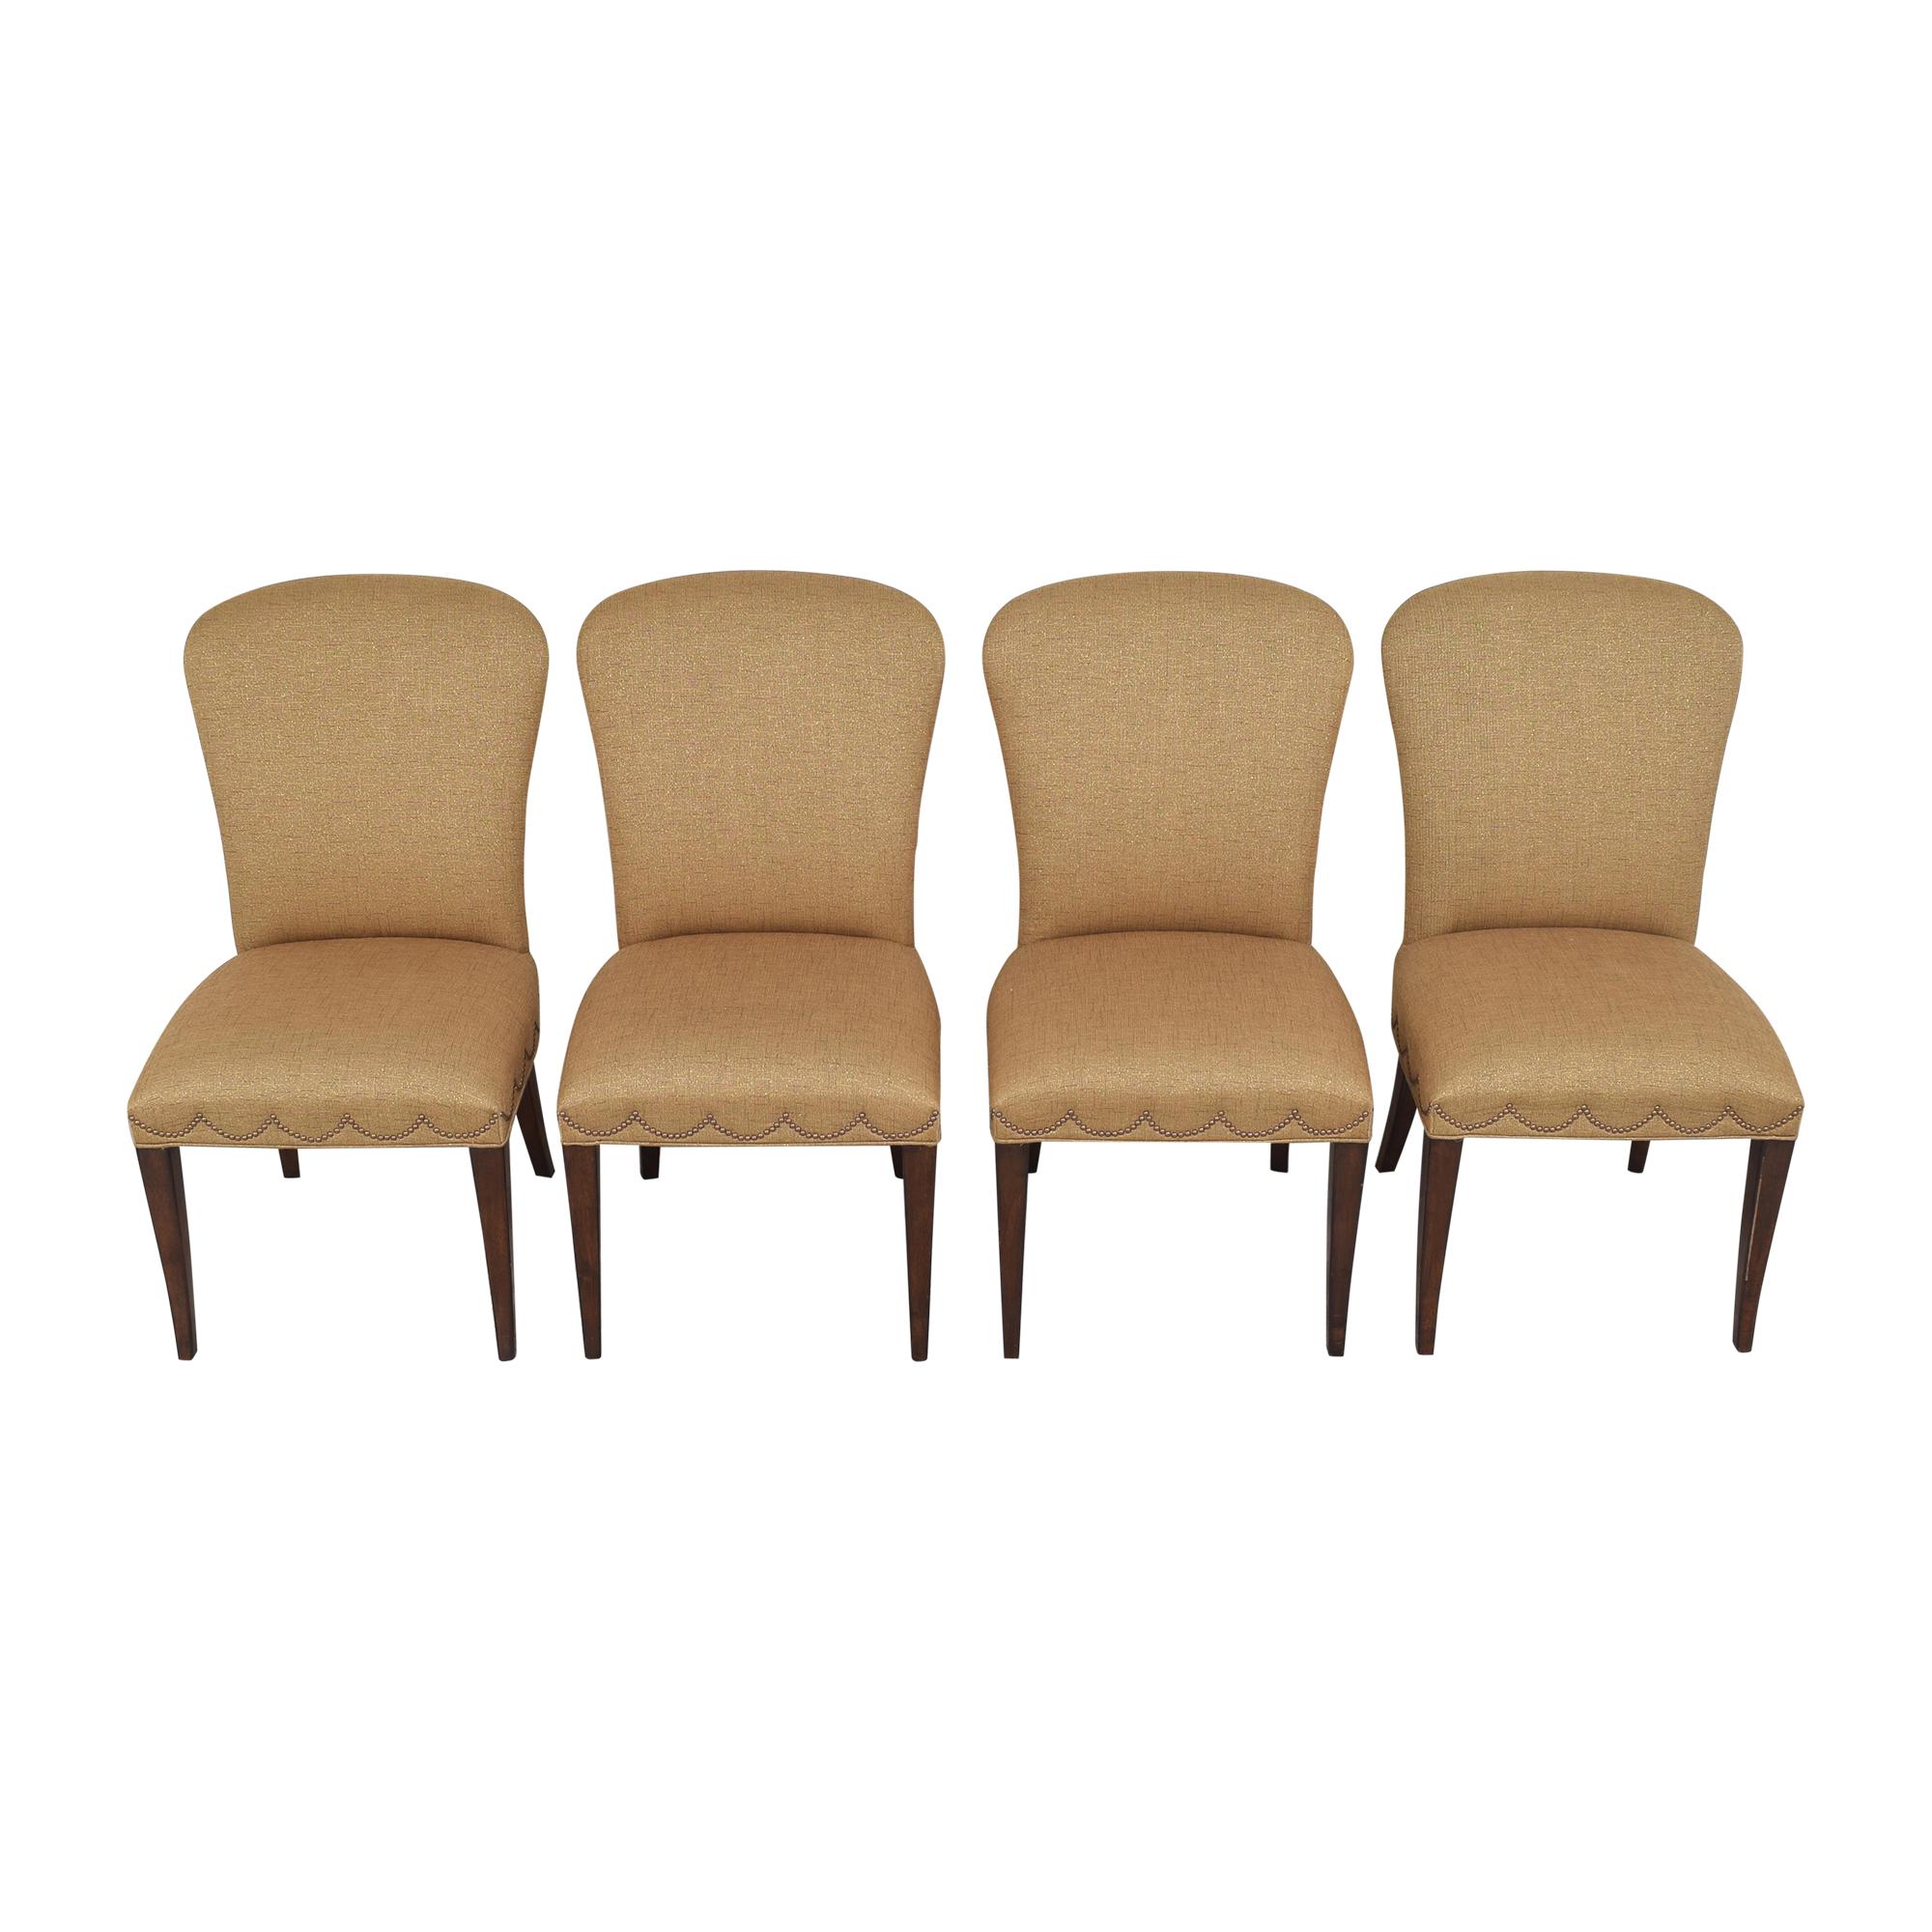 Furniture Brands International Furniture Brands International Scalloped Nailhead Dining Chairs Chairs